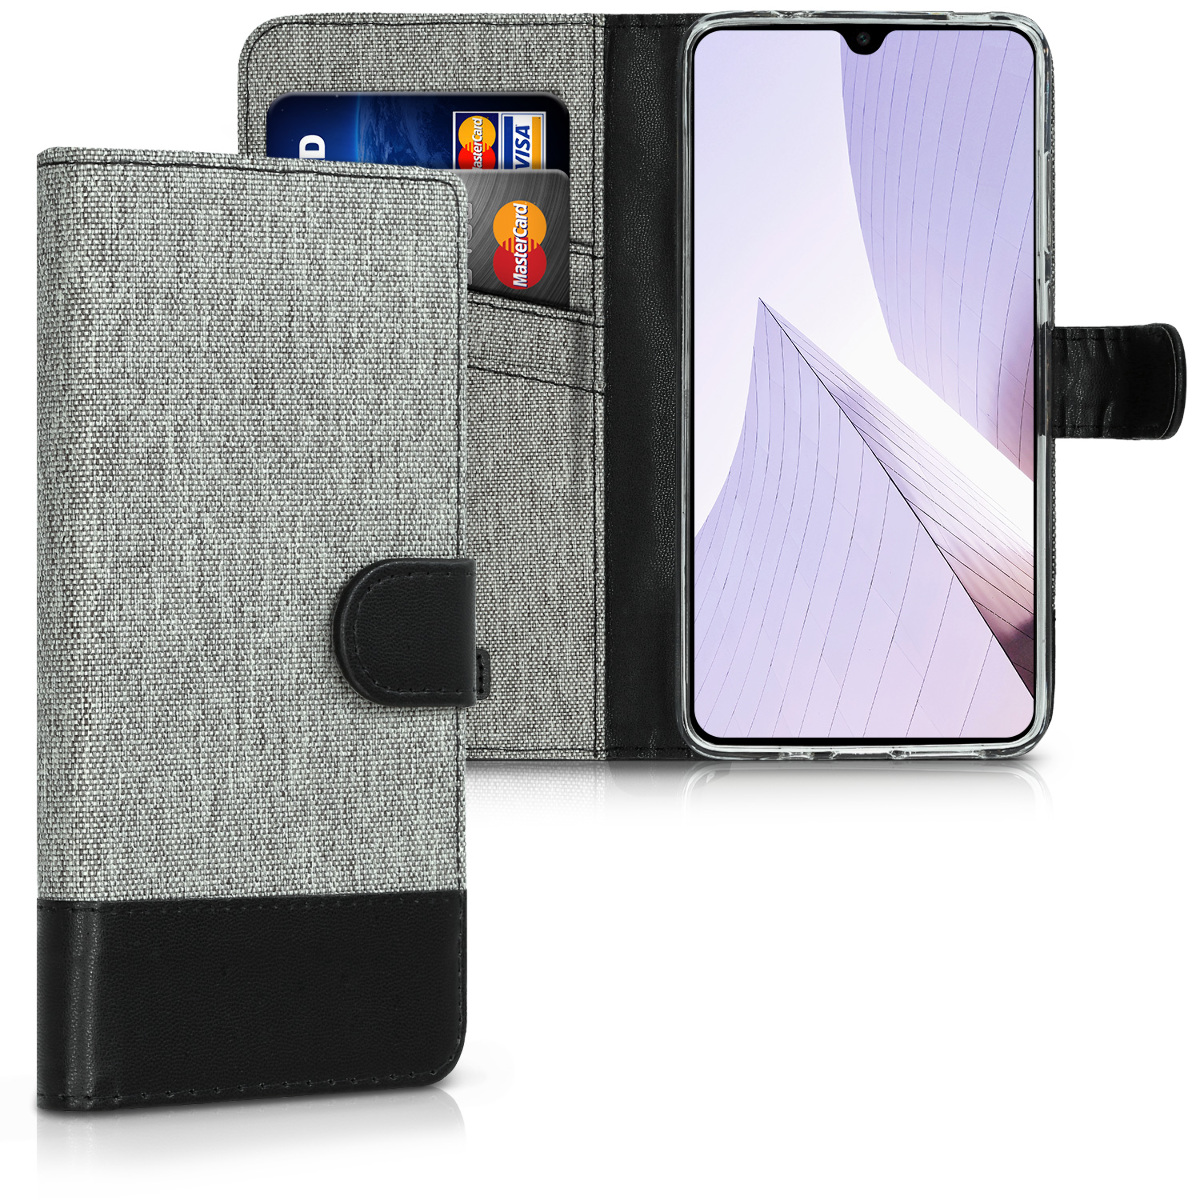 KW Θήκη - Πορτοφόλι Huawei Mate 20 - Grey / Black (46396.01)